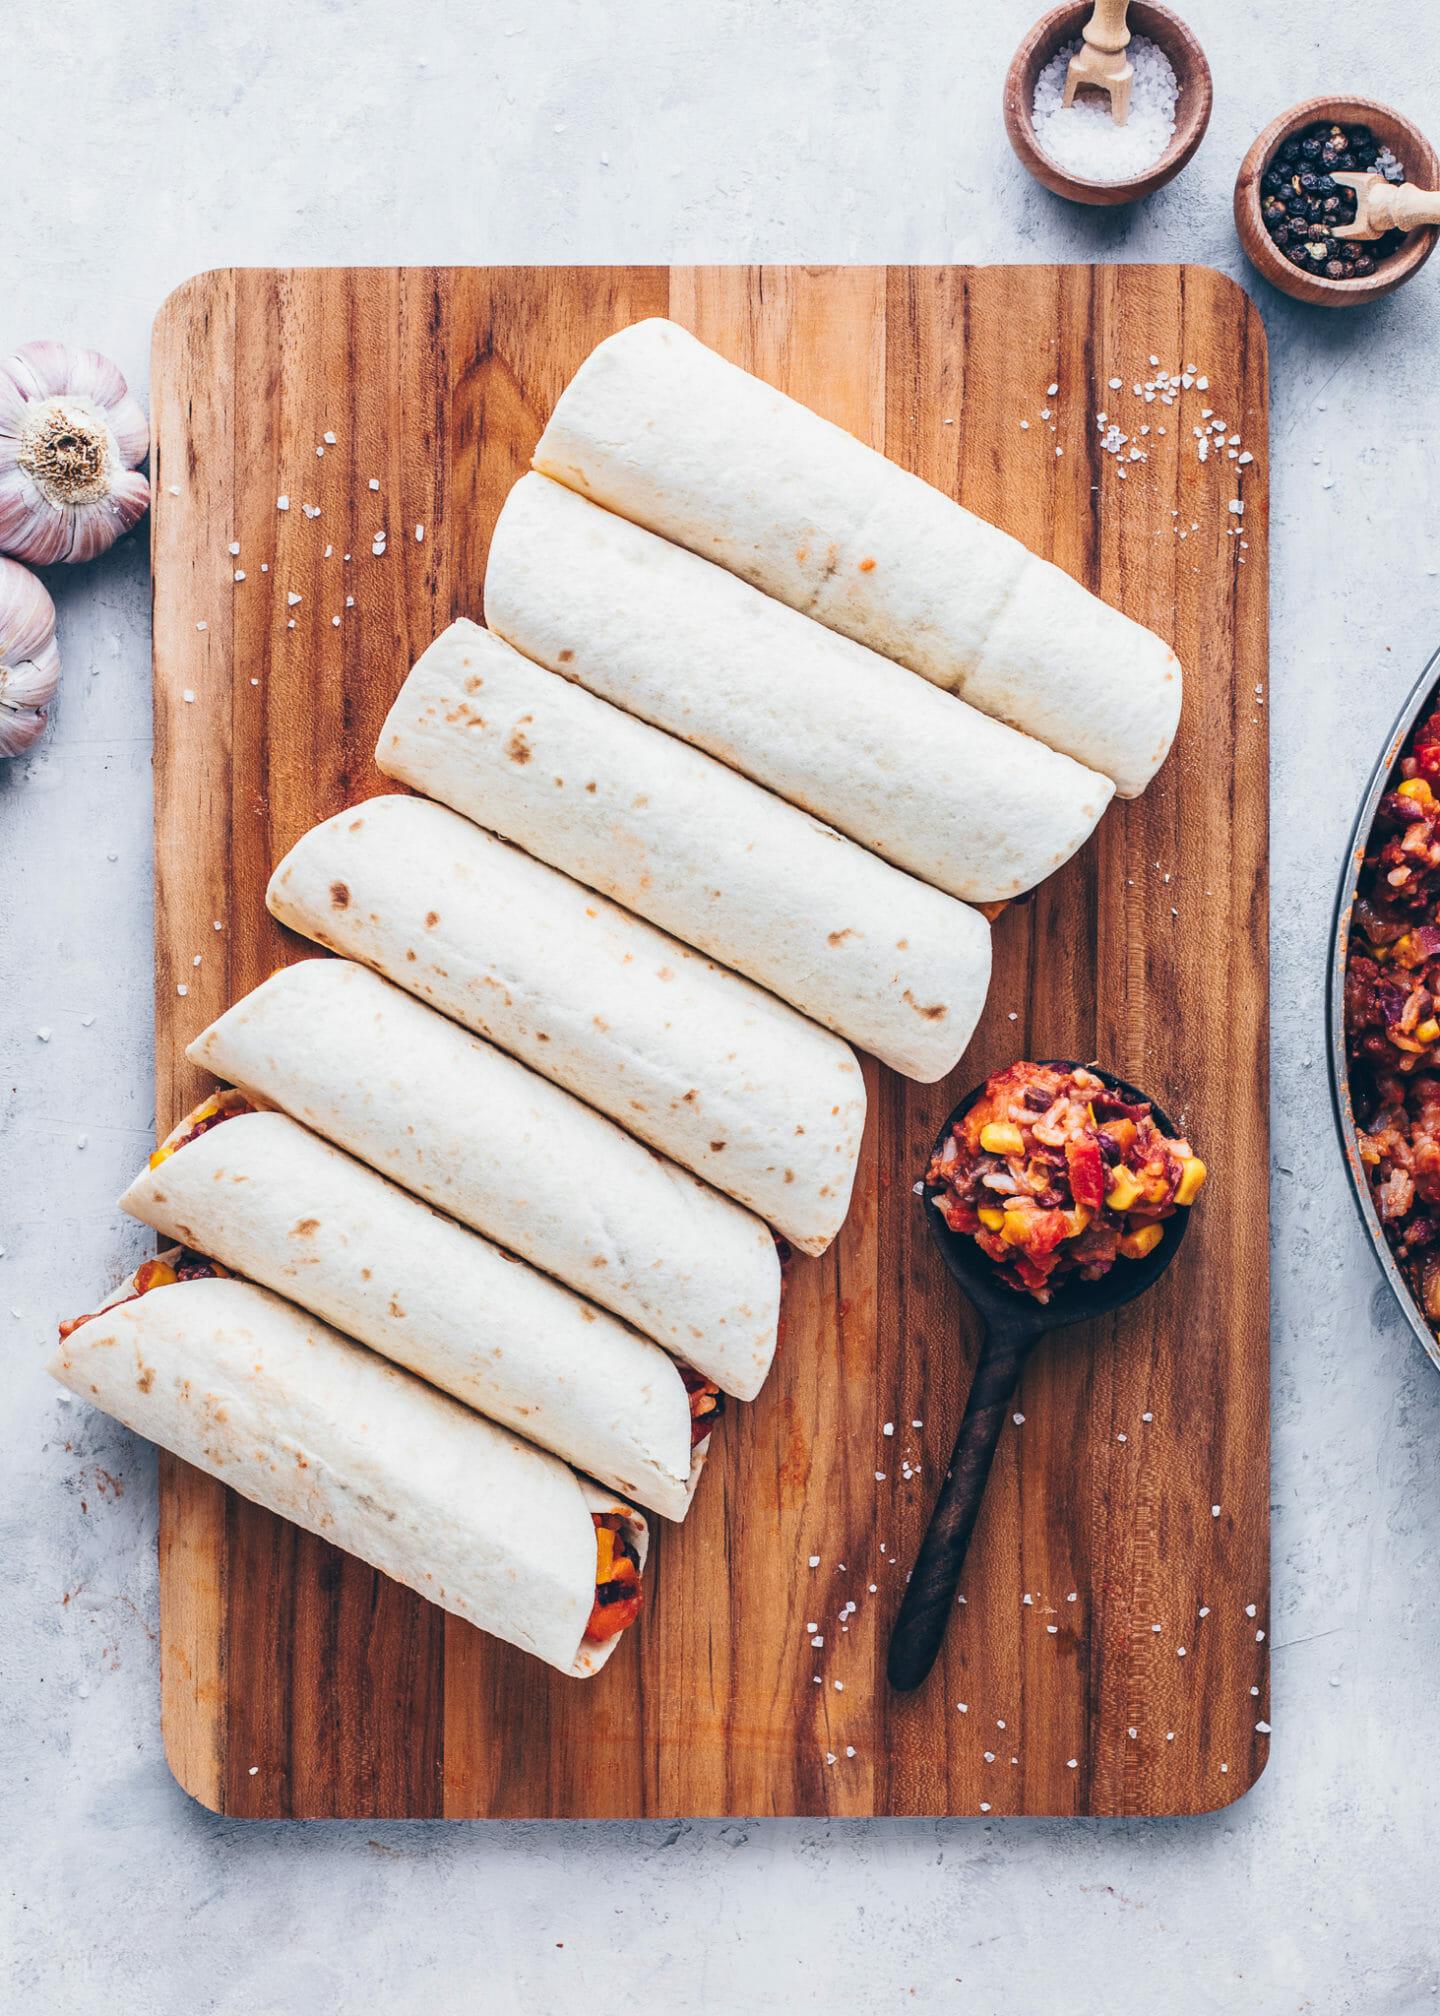 wrapped enchiladas on a chopping board